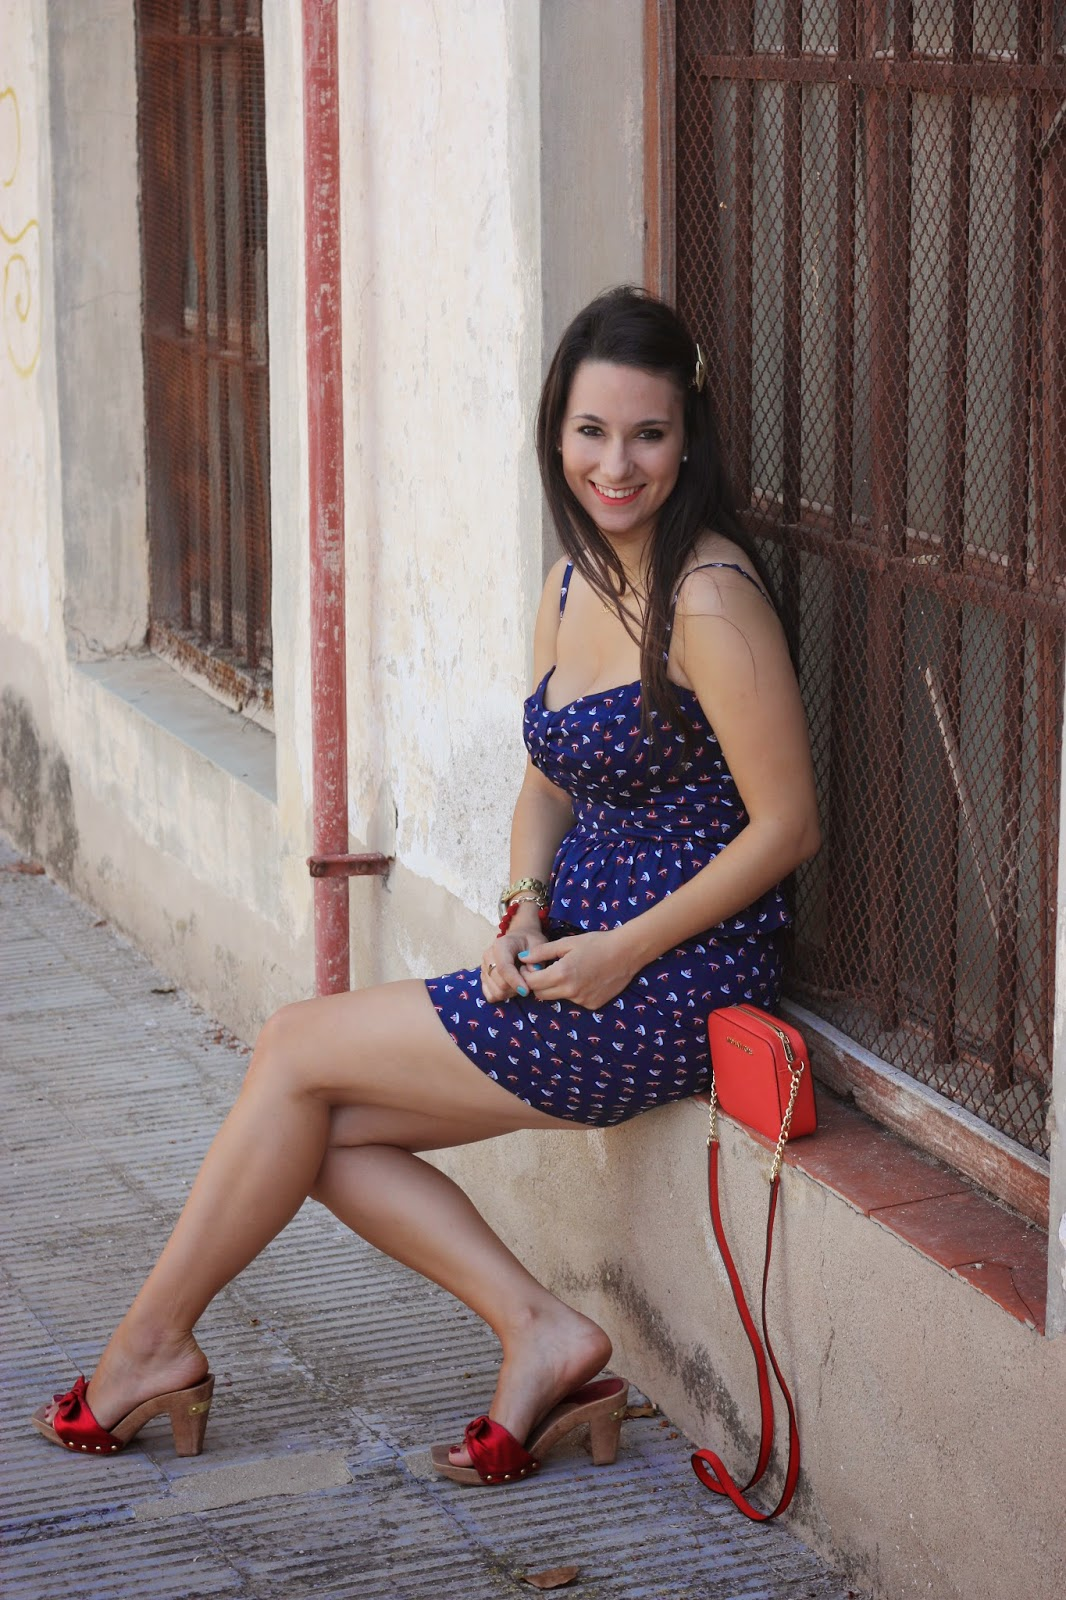 http://silviparalasamigas.blogspot.com.es/2014/06/vestido-barcos-de-blanco.html